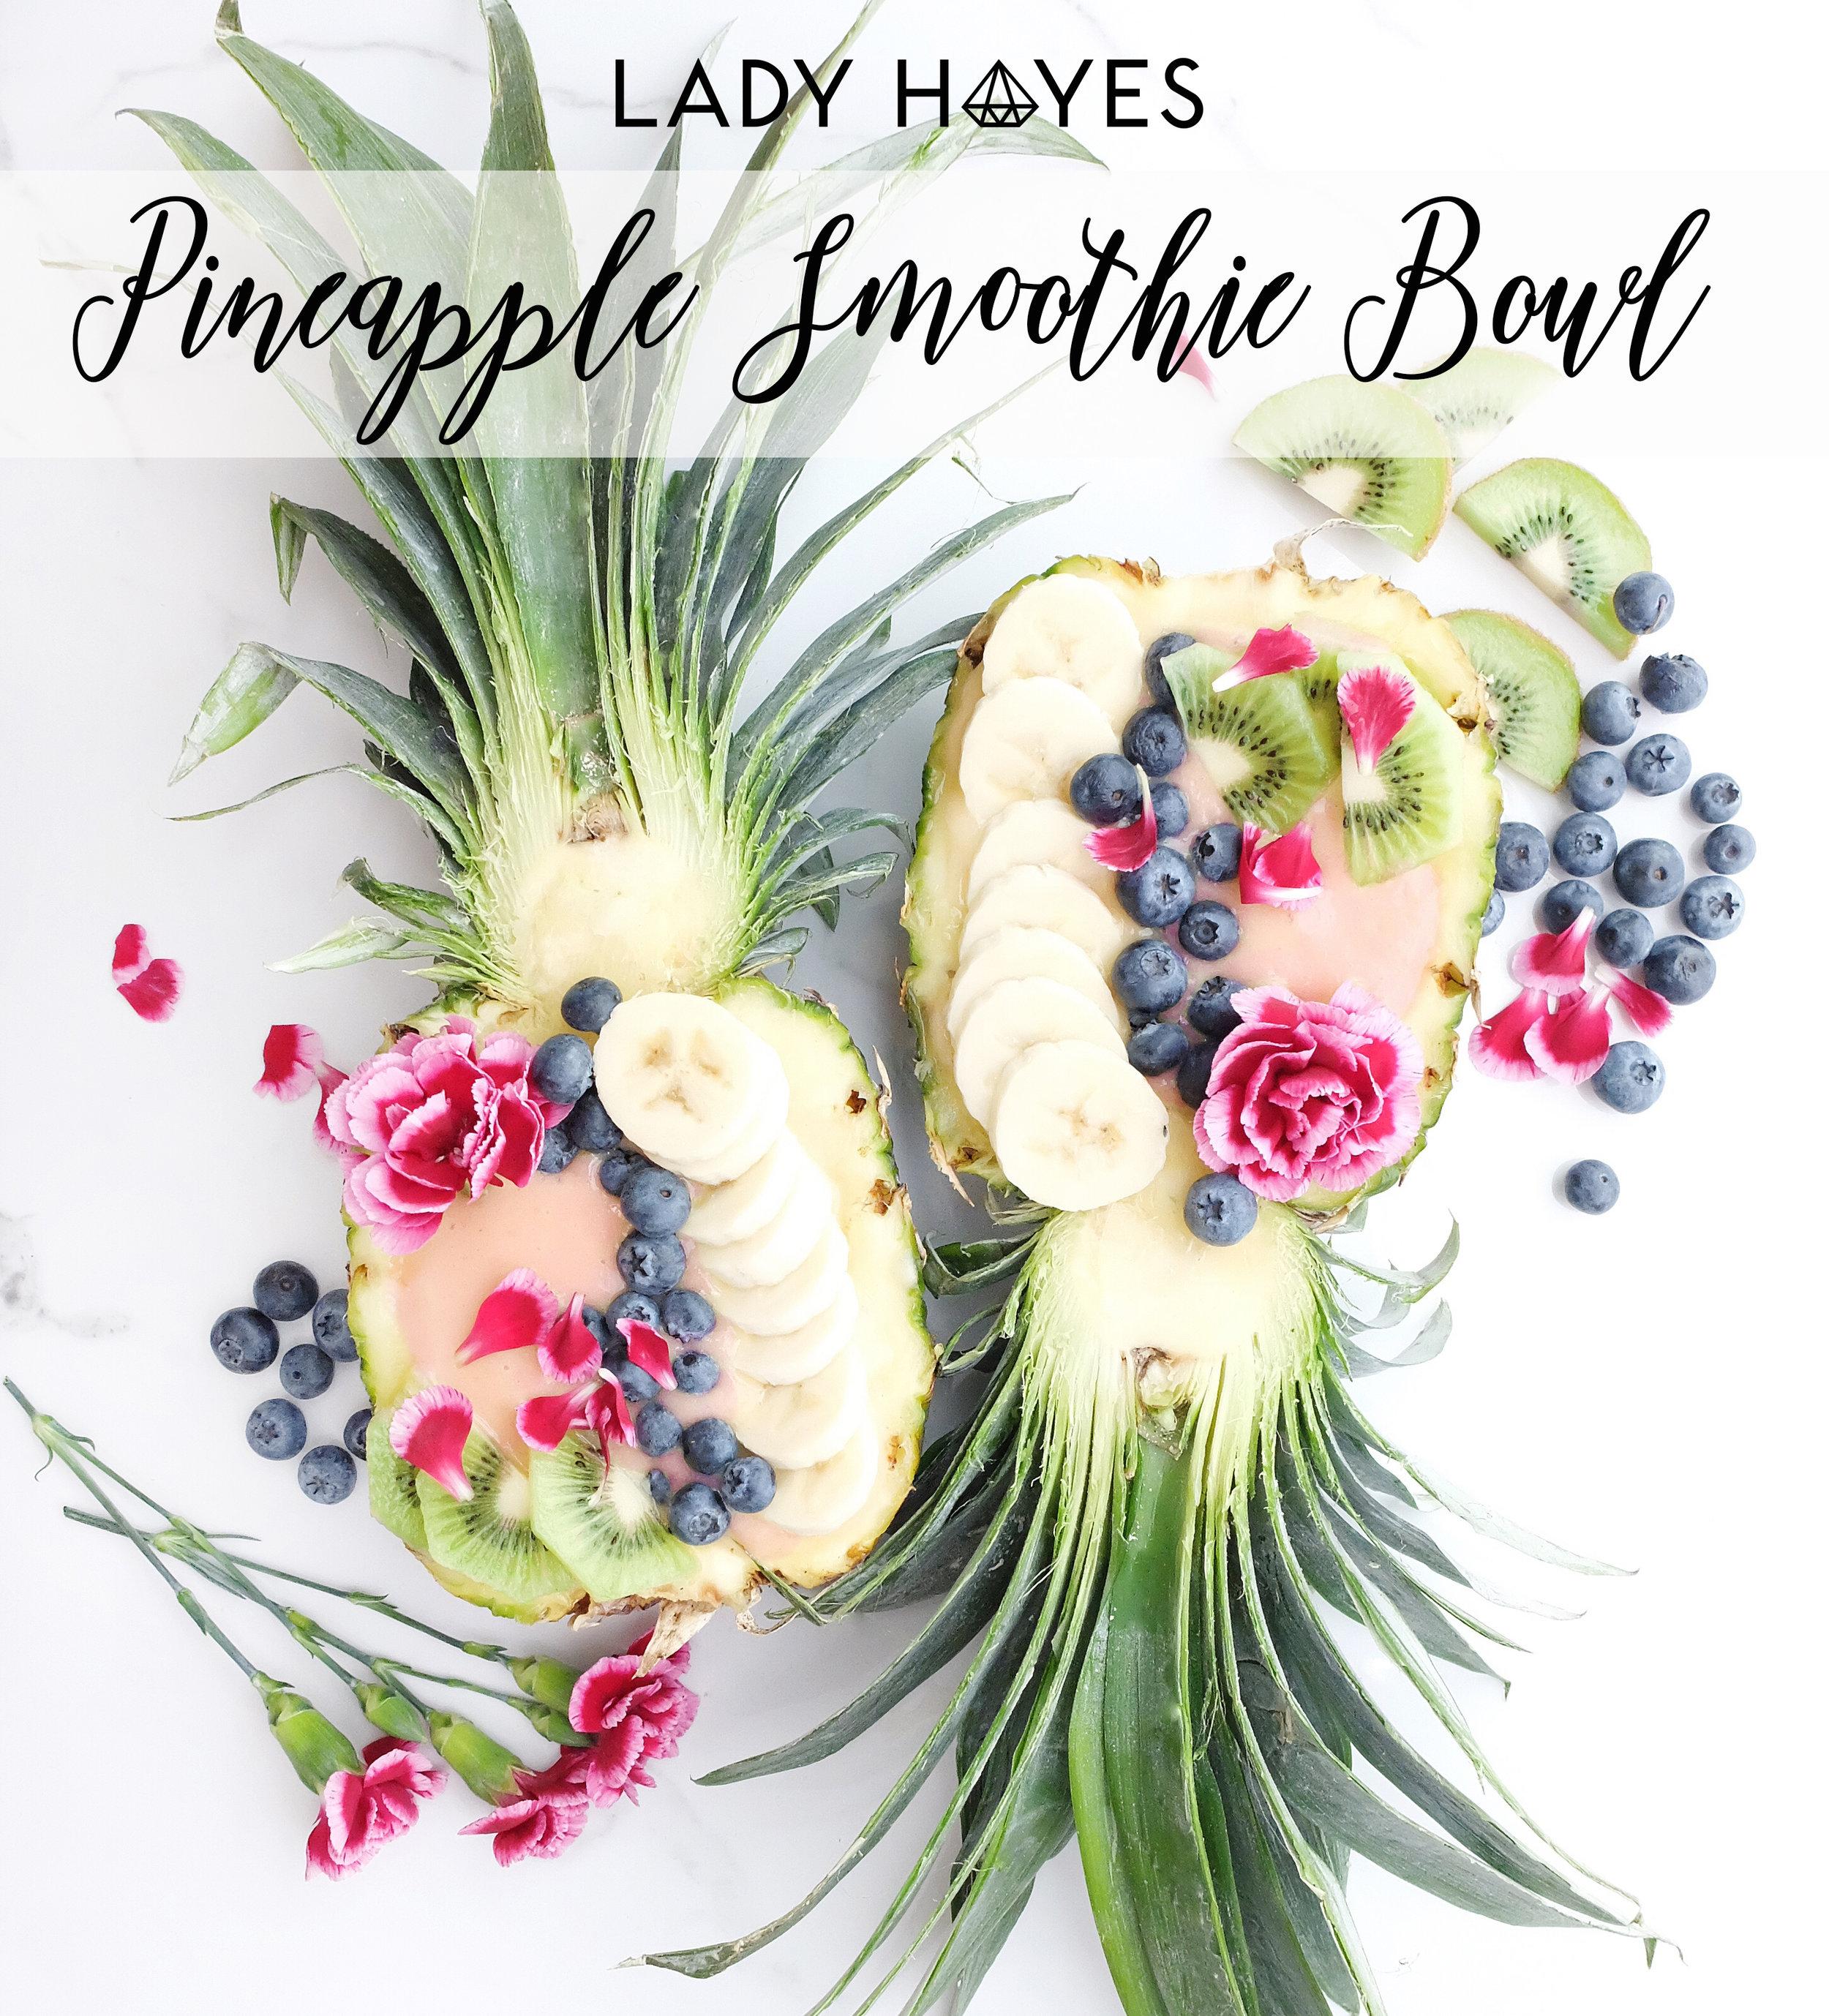 PINEAPPLE SMOOTHIE BOWL.jpg